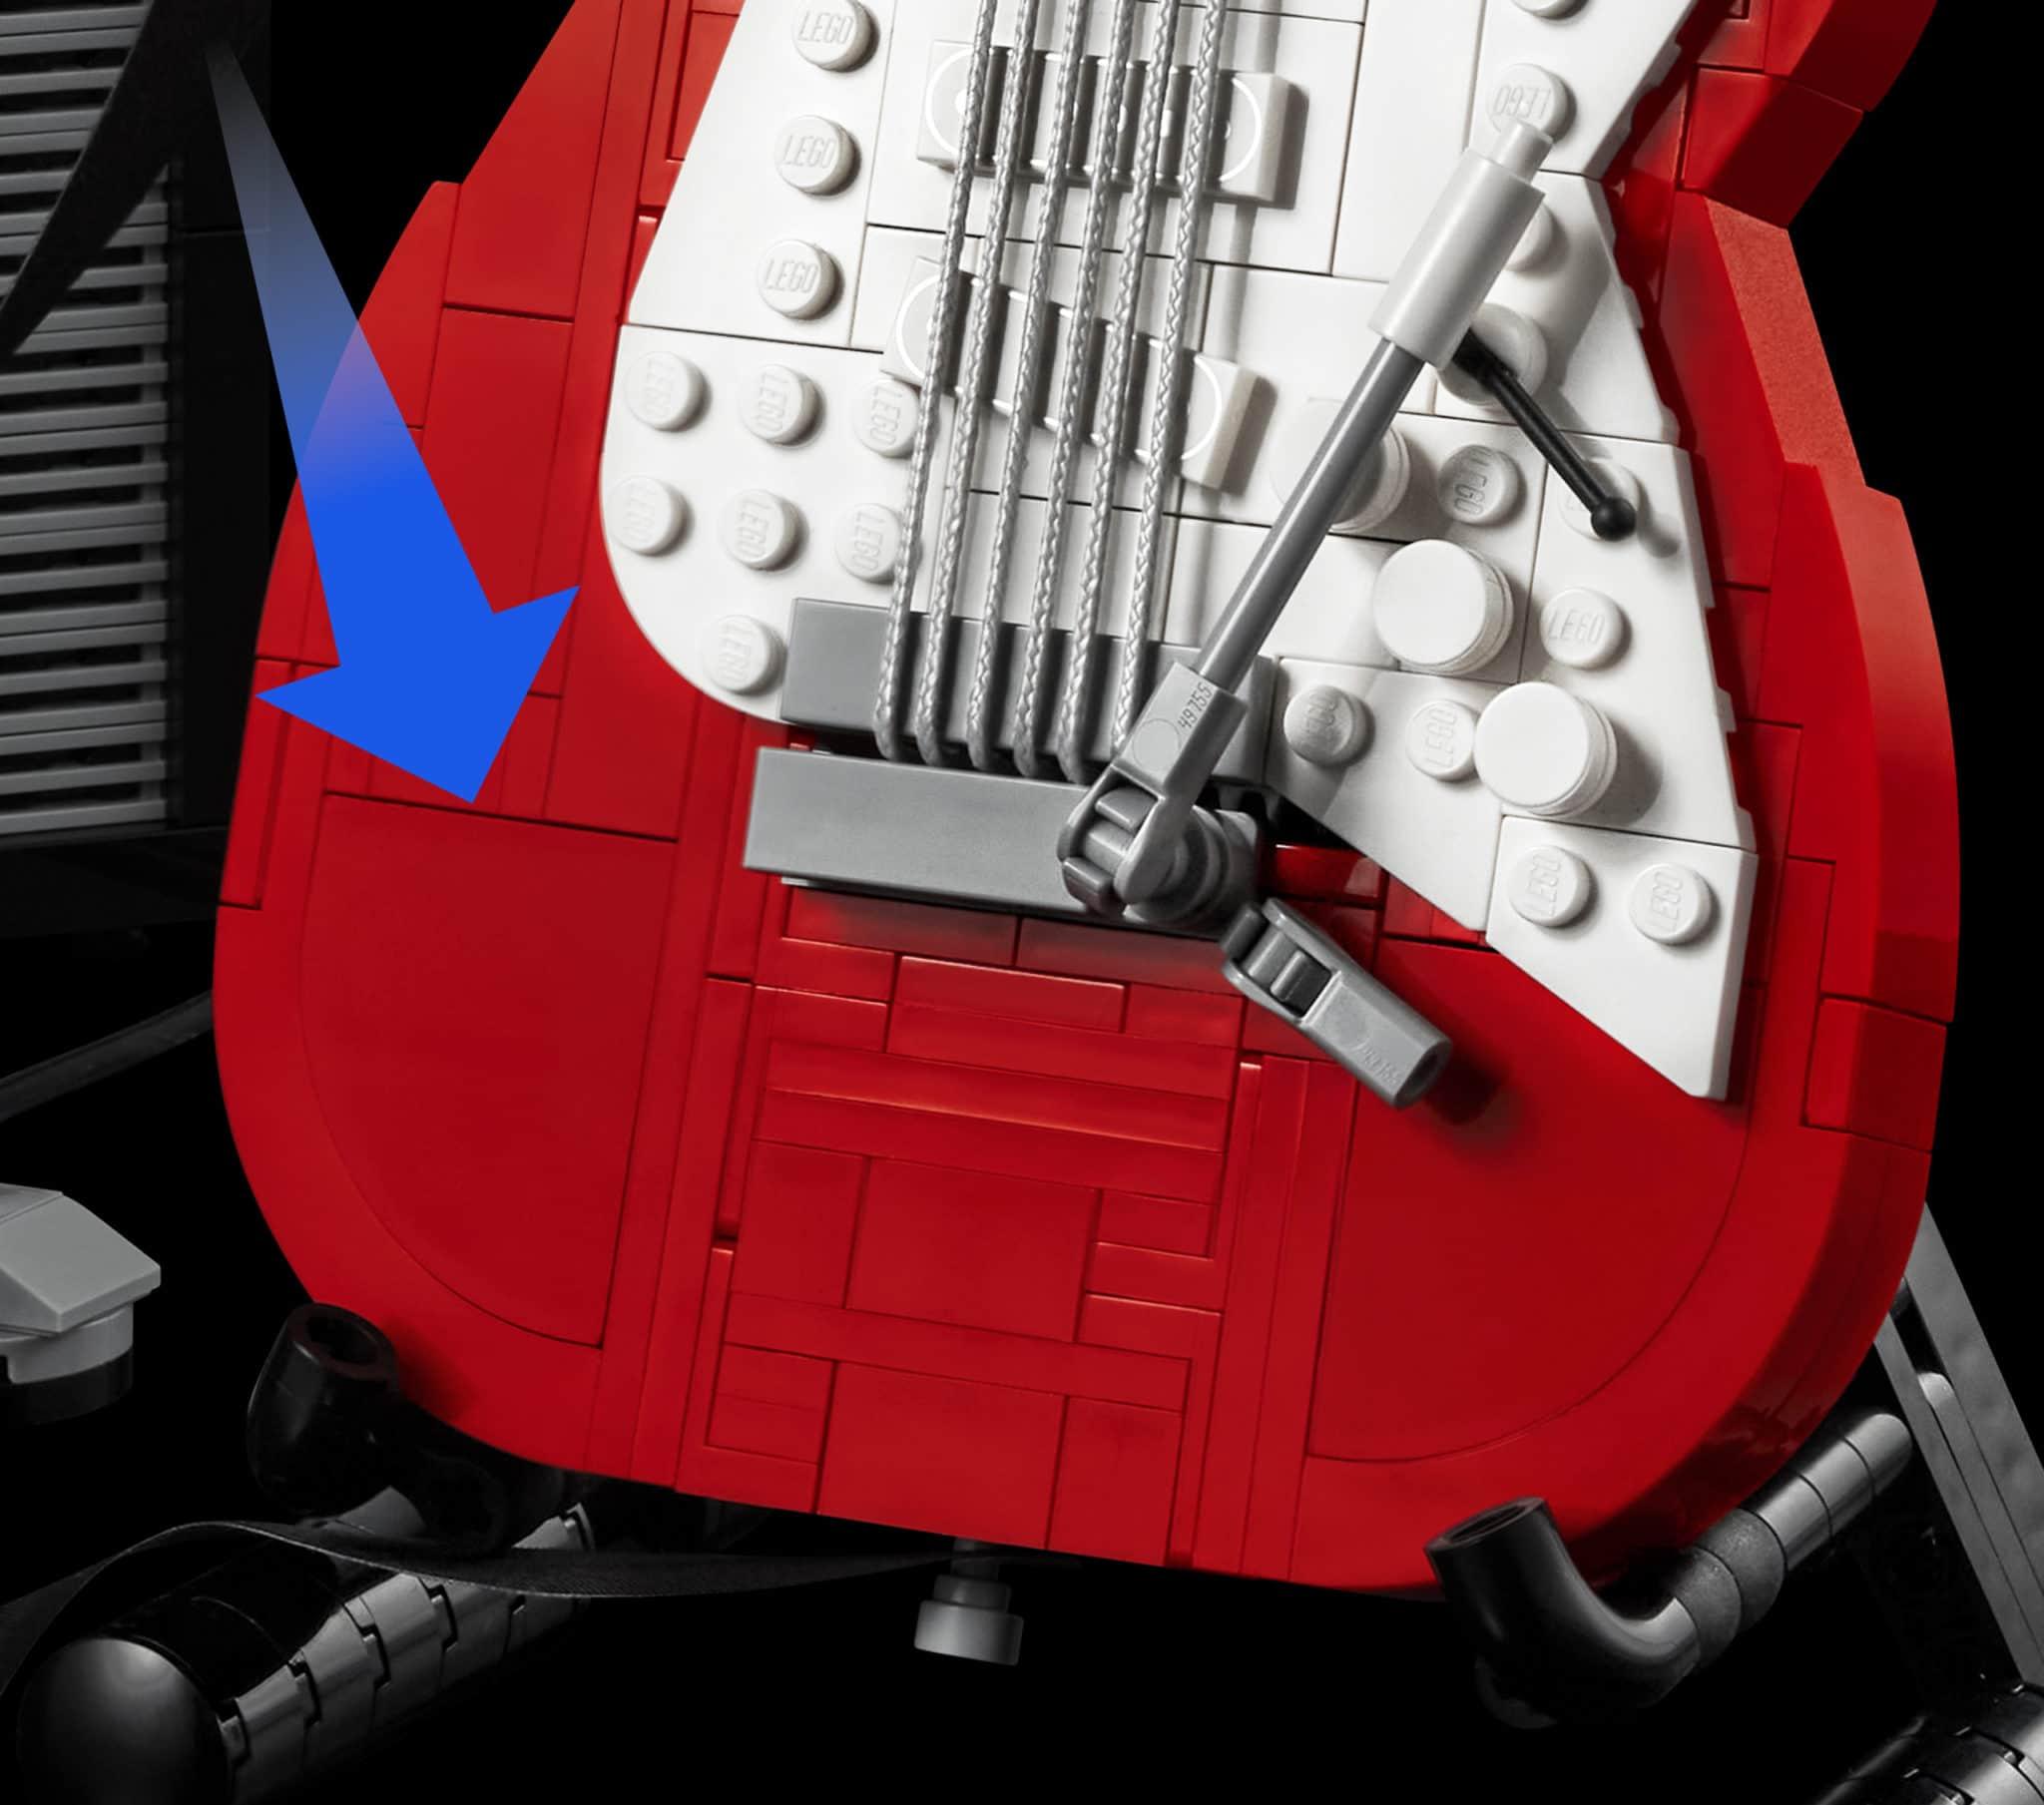 LEGO 21329 Fender Stratocaster Neue Teile05